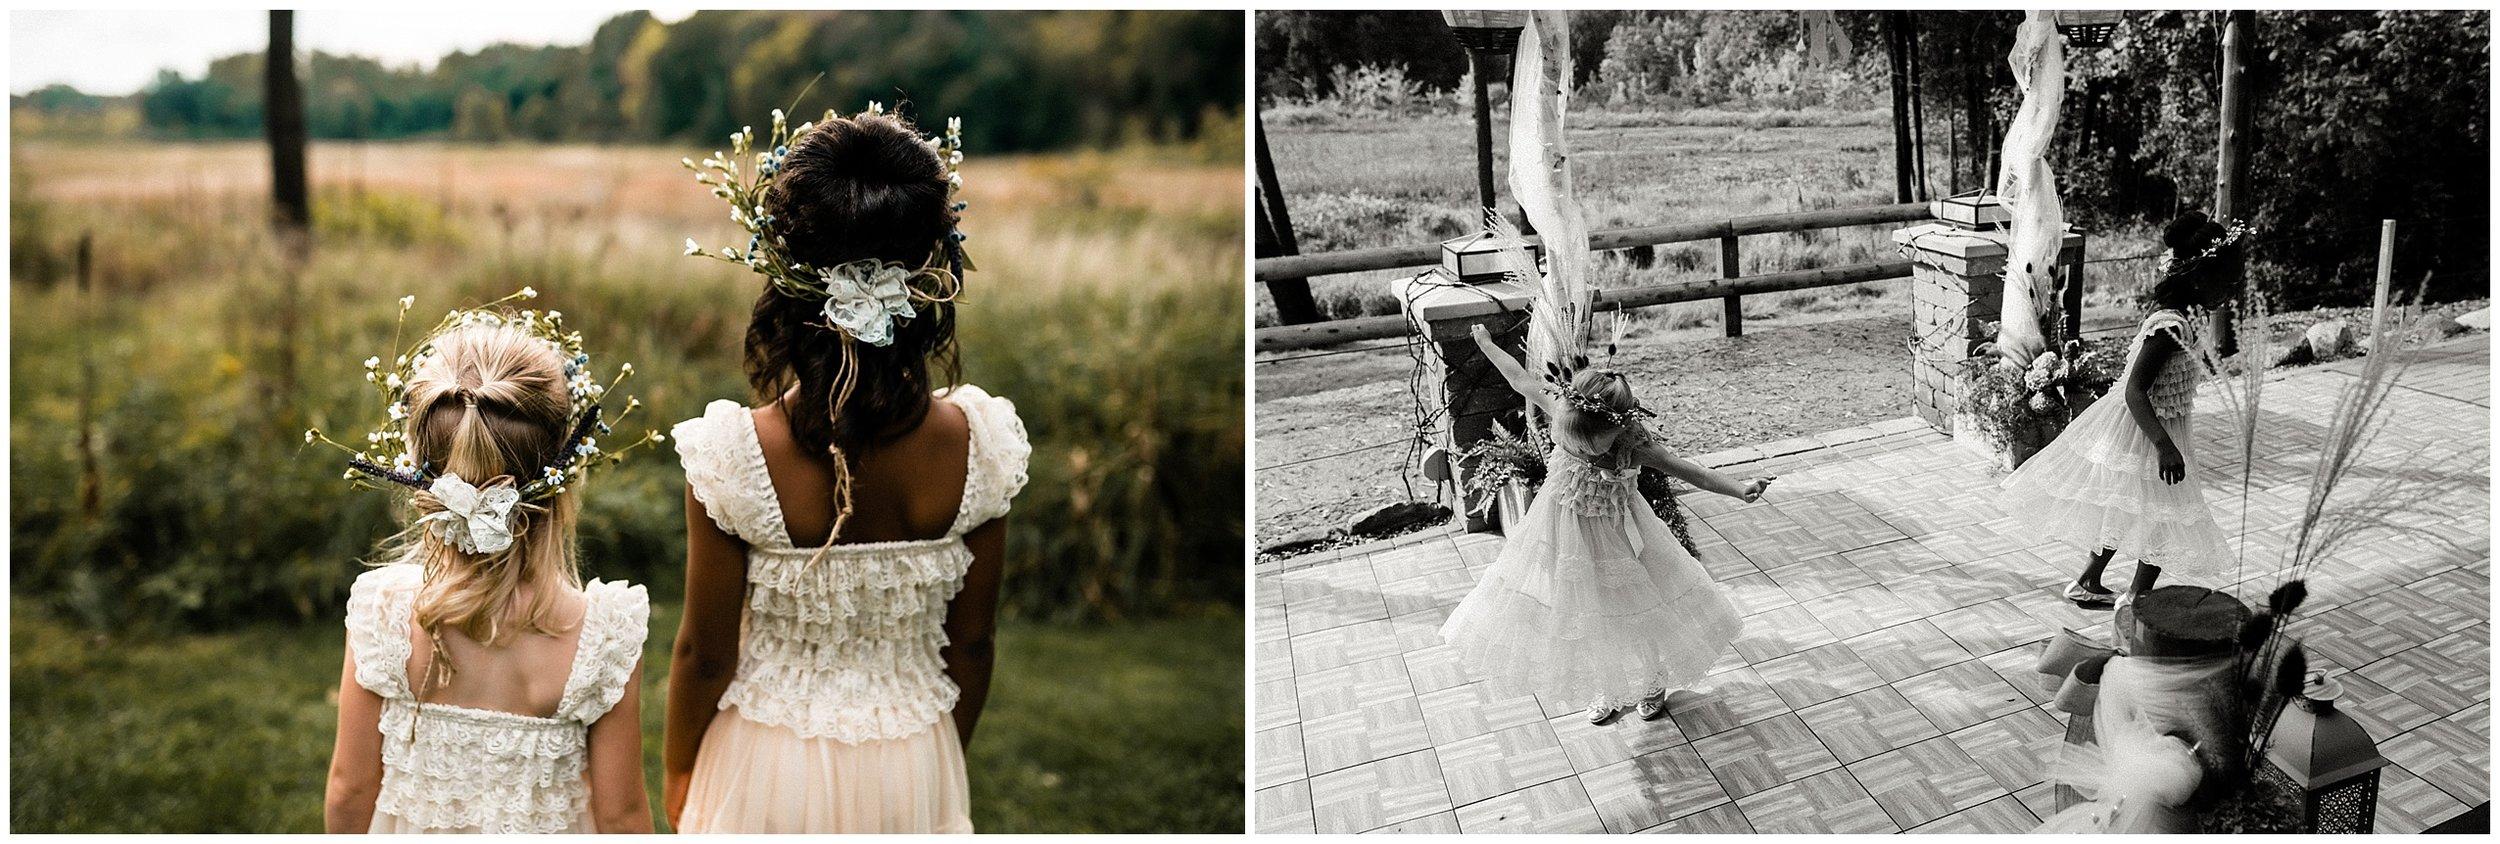 Jerod + Ashley | Just Married #kyleepaigephotography_1788.jpg